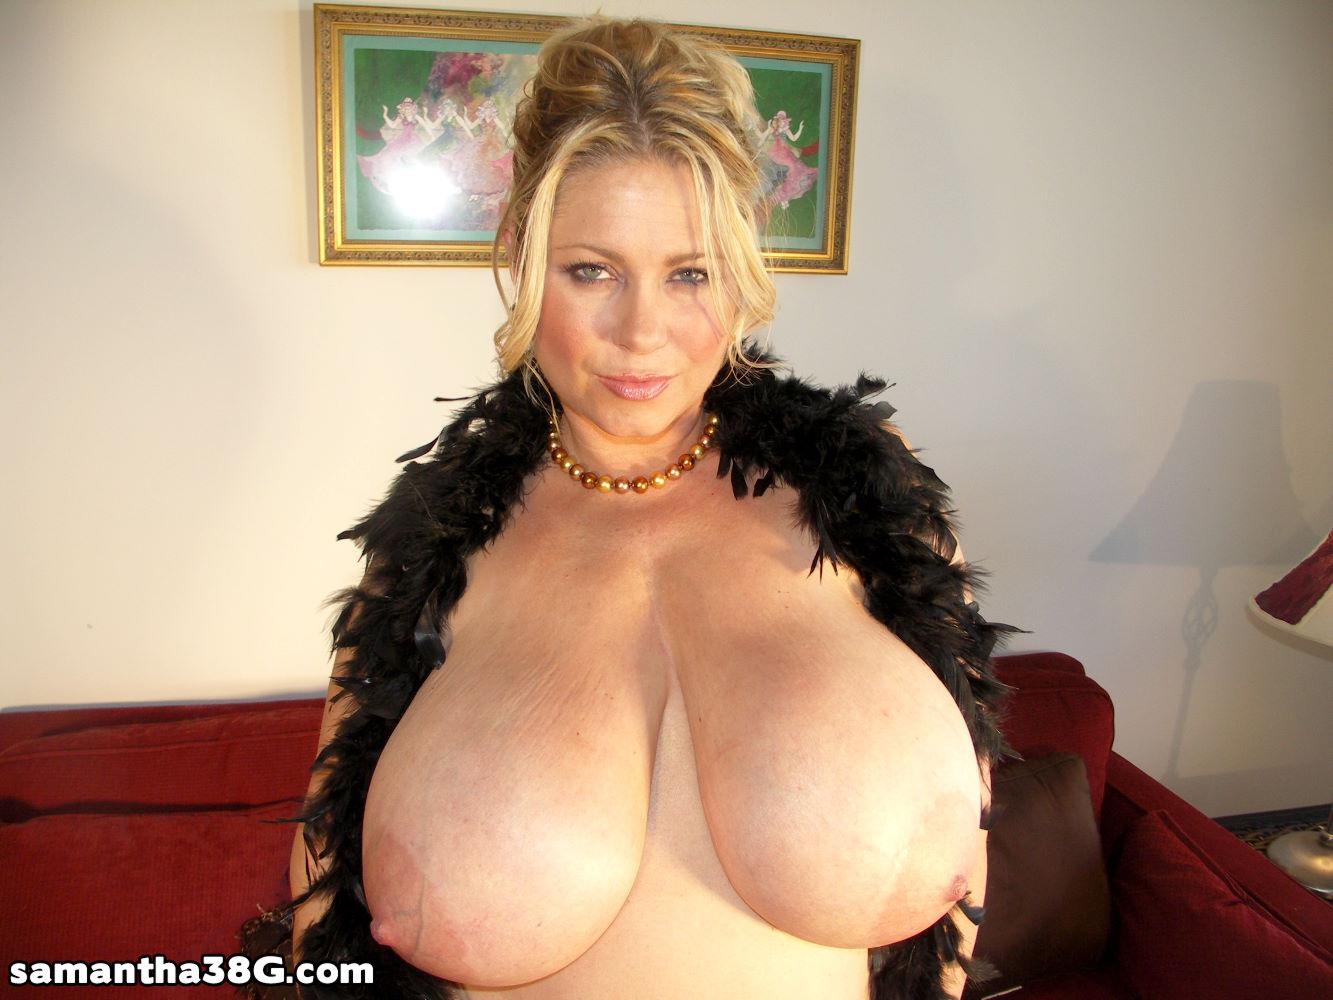 erotic woman video